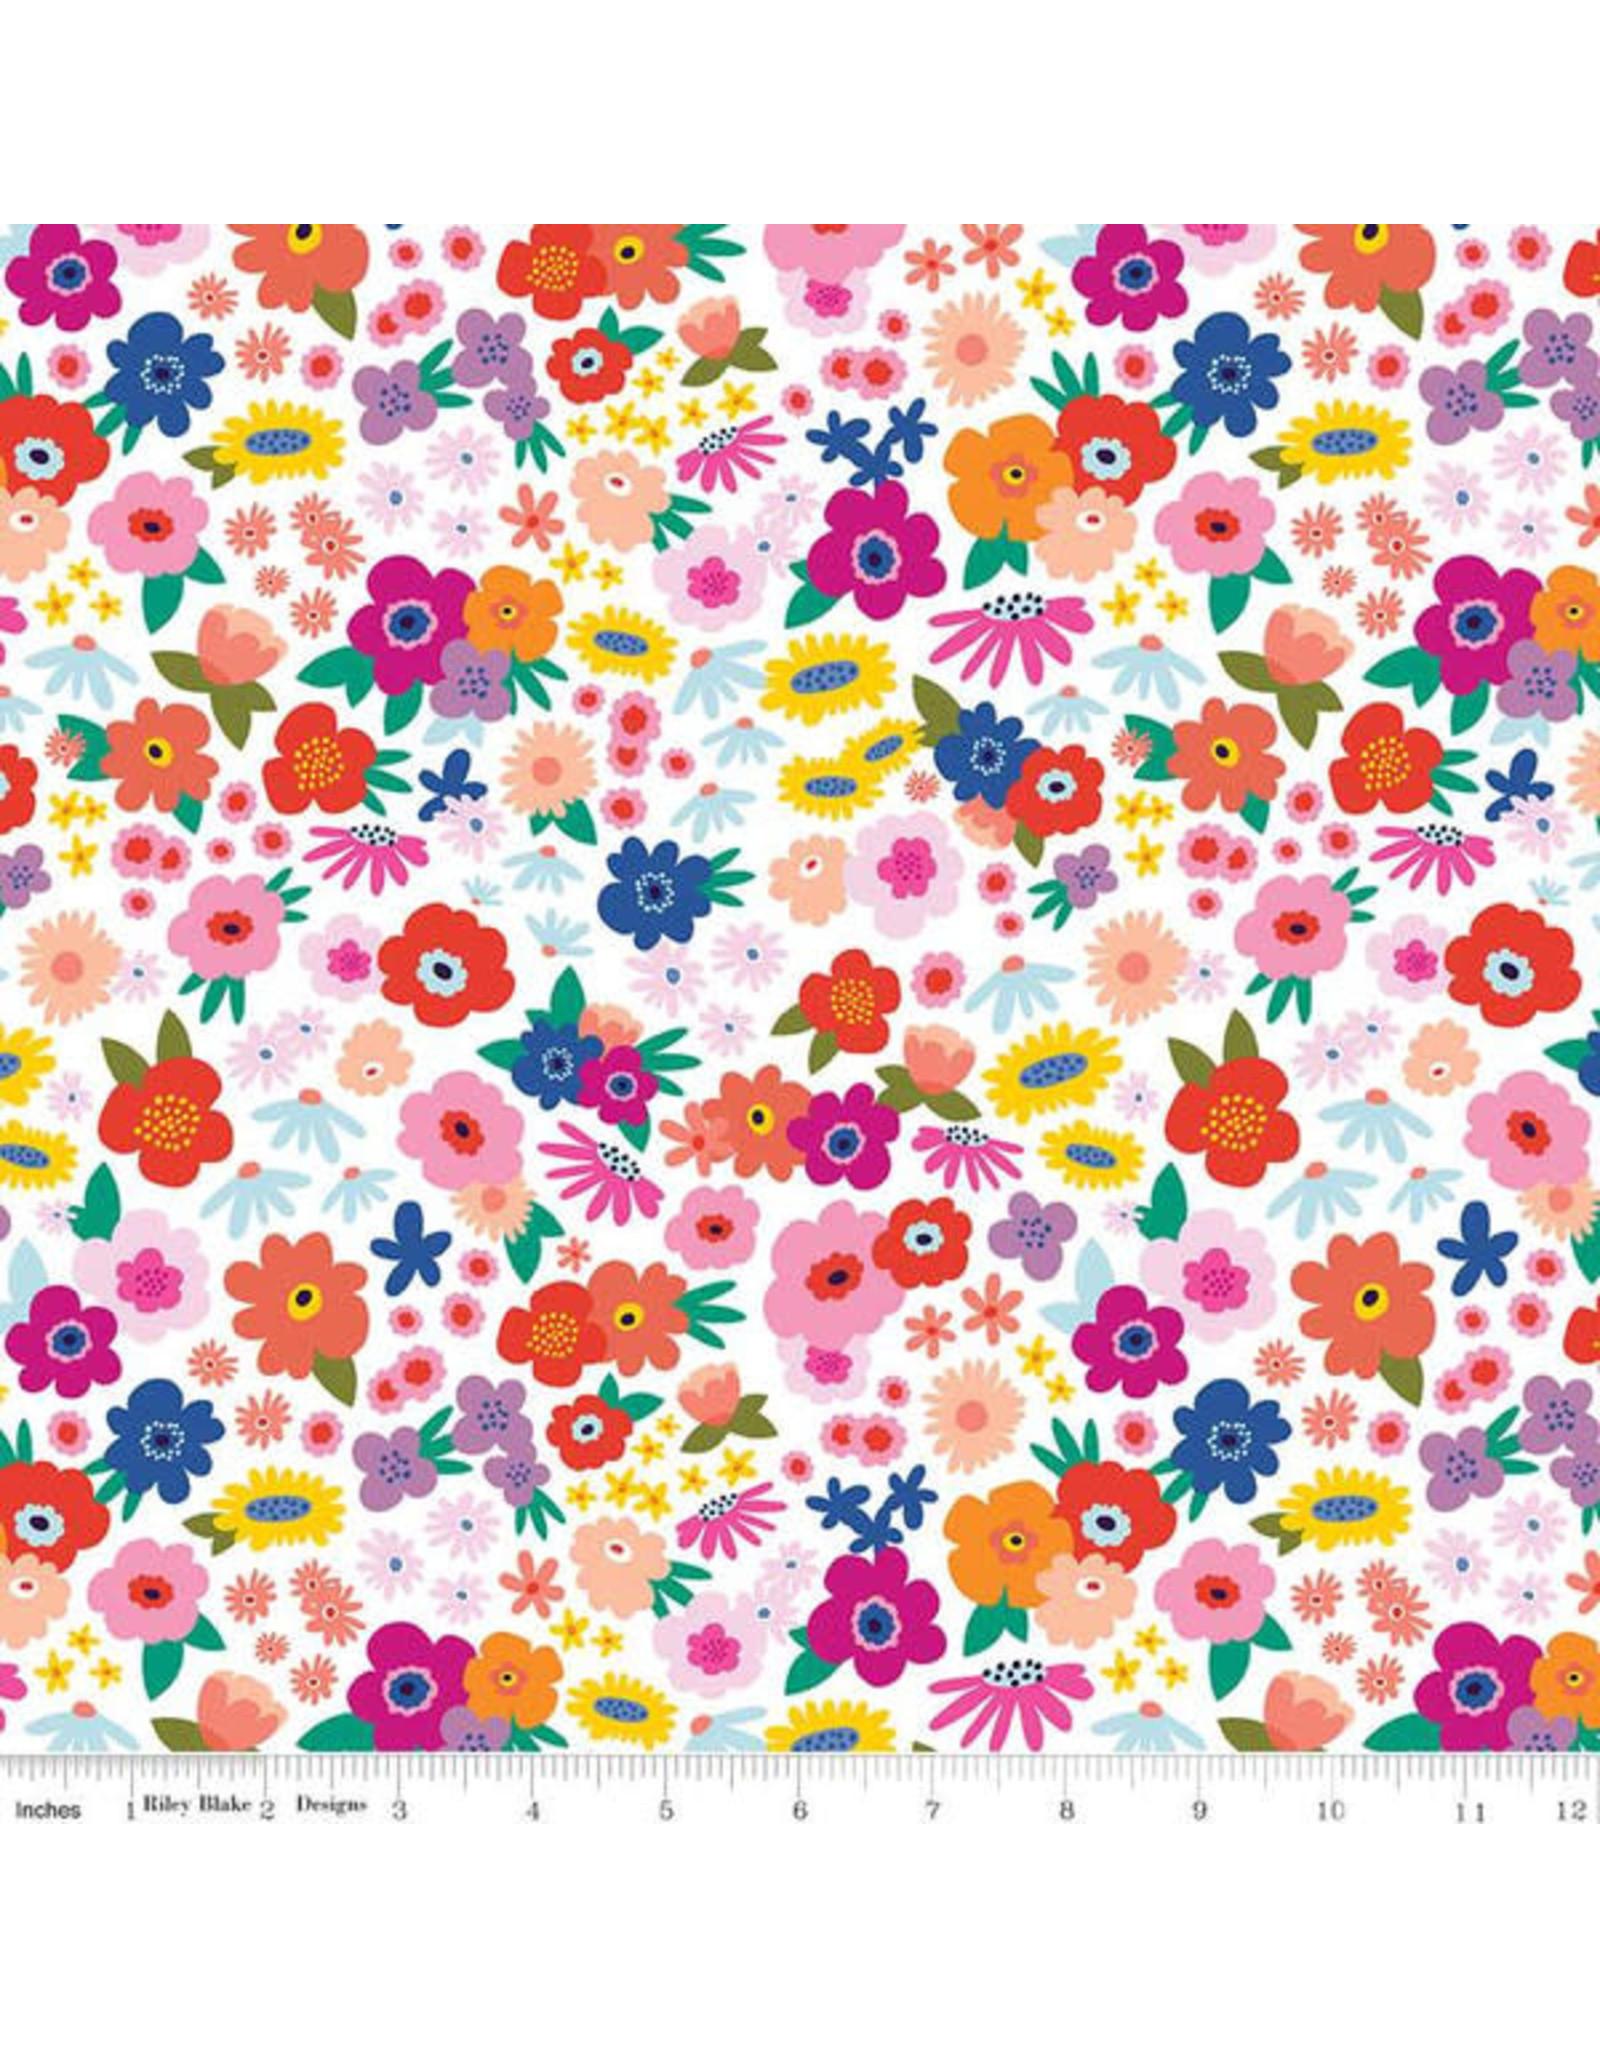 Riley Blake Designs GRL PWR - Bloom Babe White